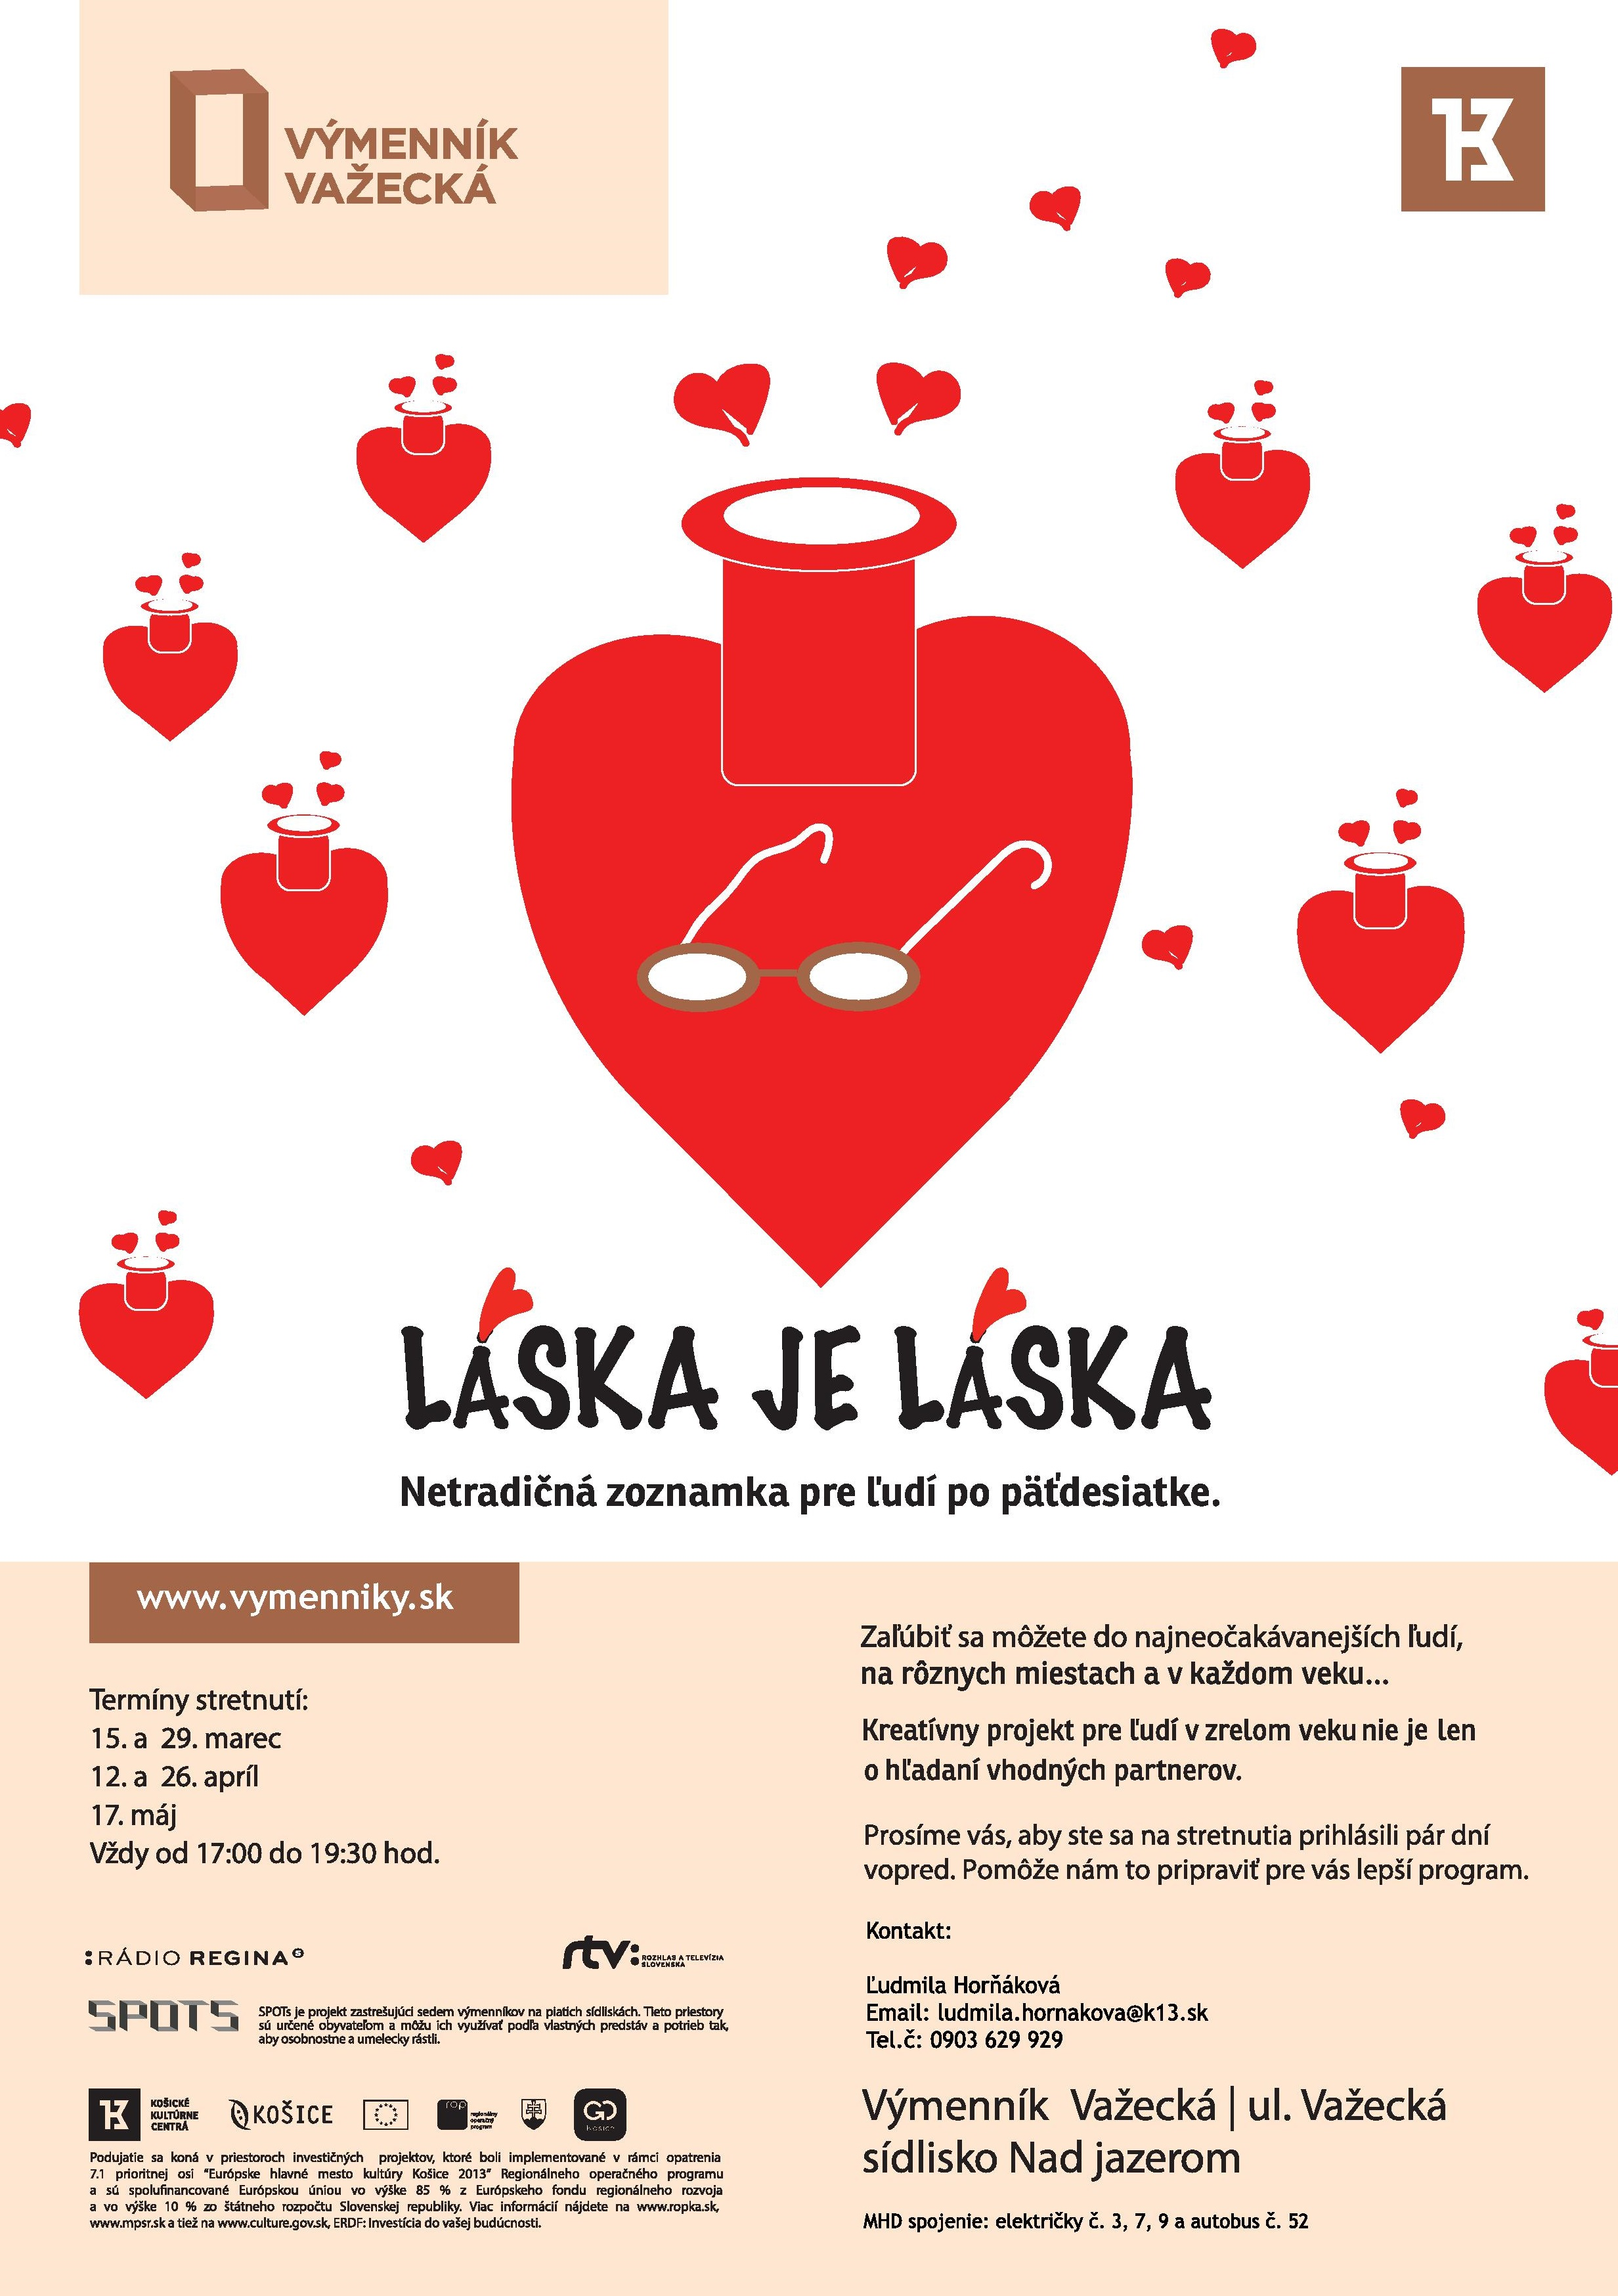 A2_LaskaJeLaska 10.2